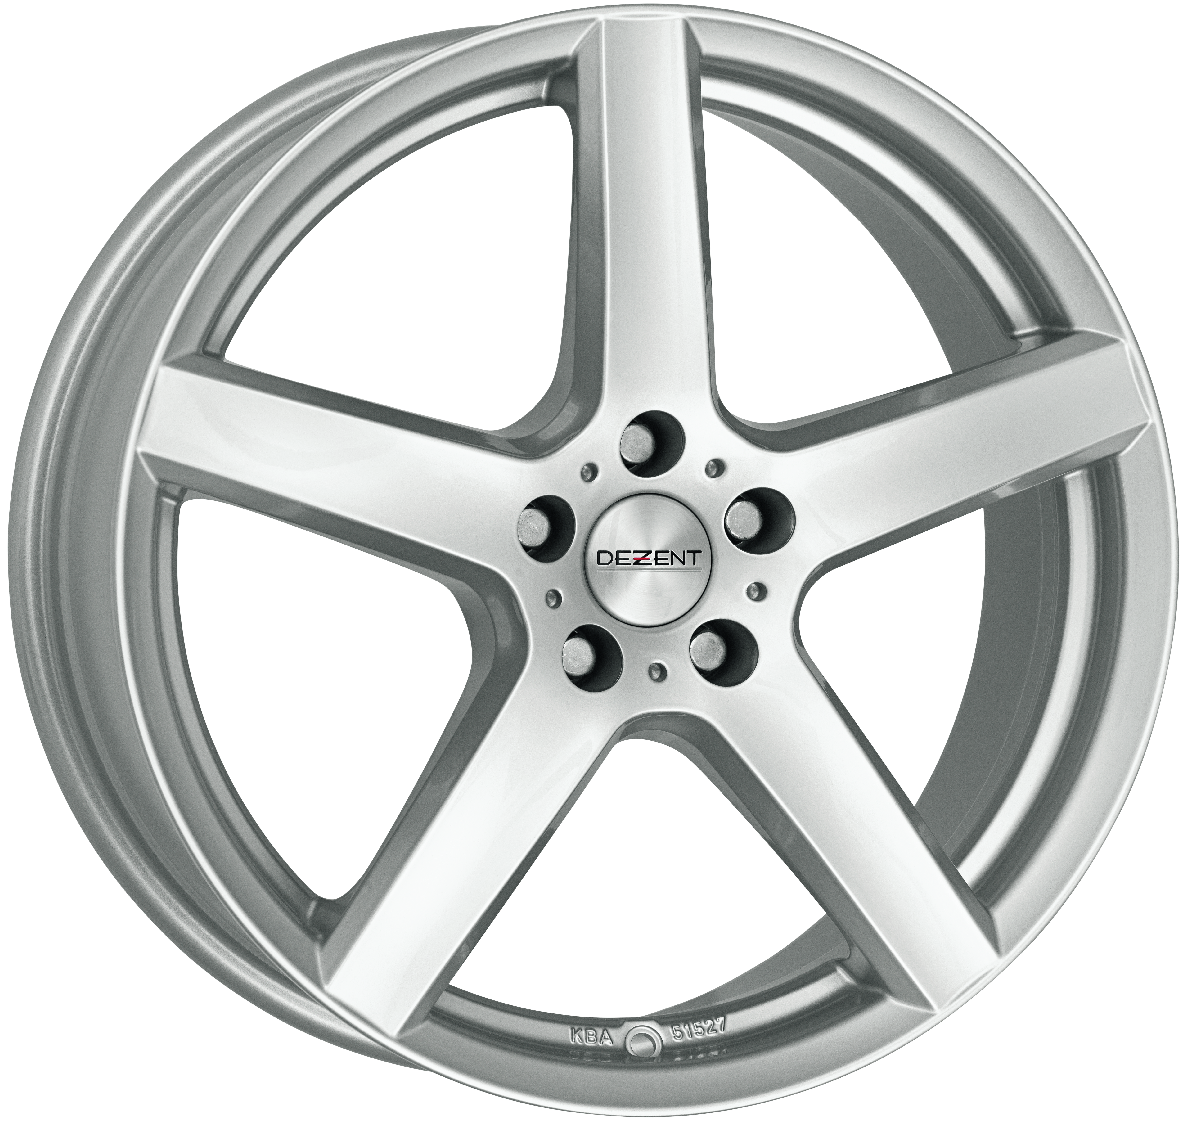 Dezent - TY (Silver)